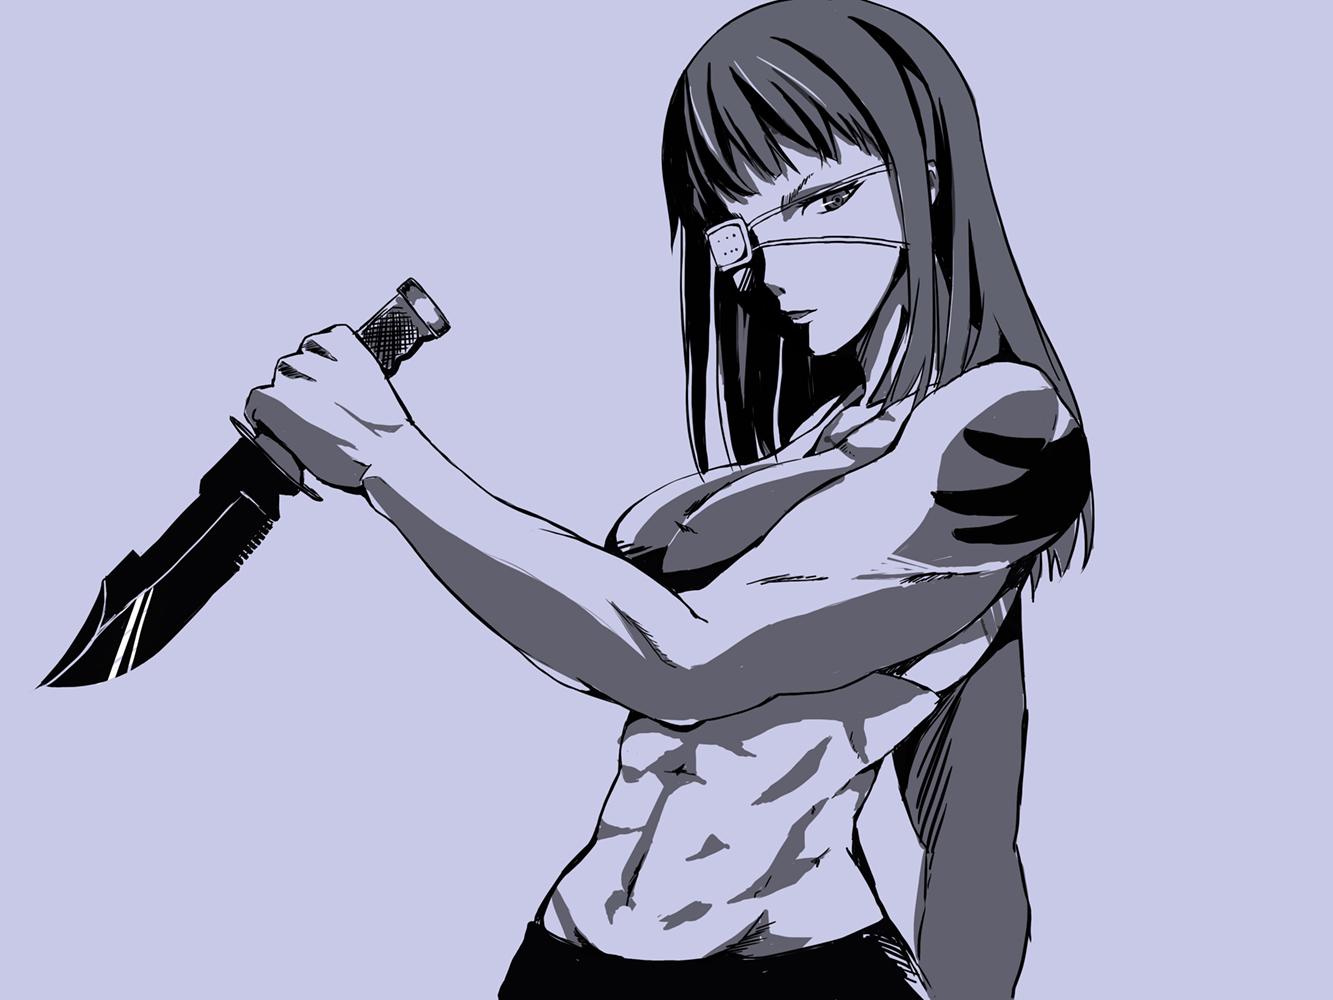 Sofia Valmet - Jormungand - Zerochan Anime Image Board